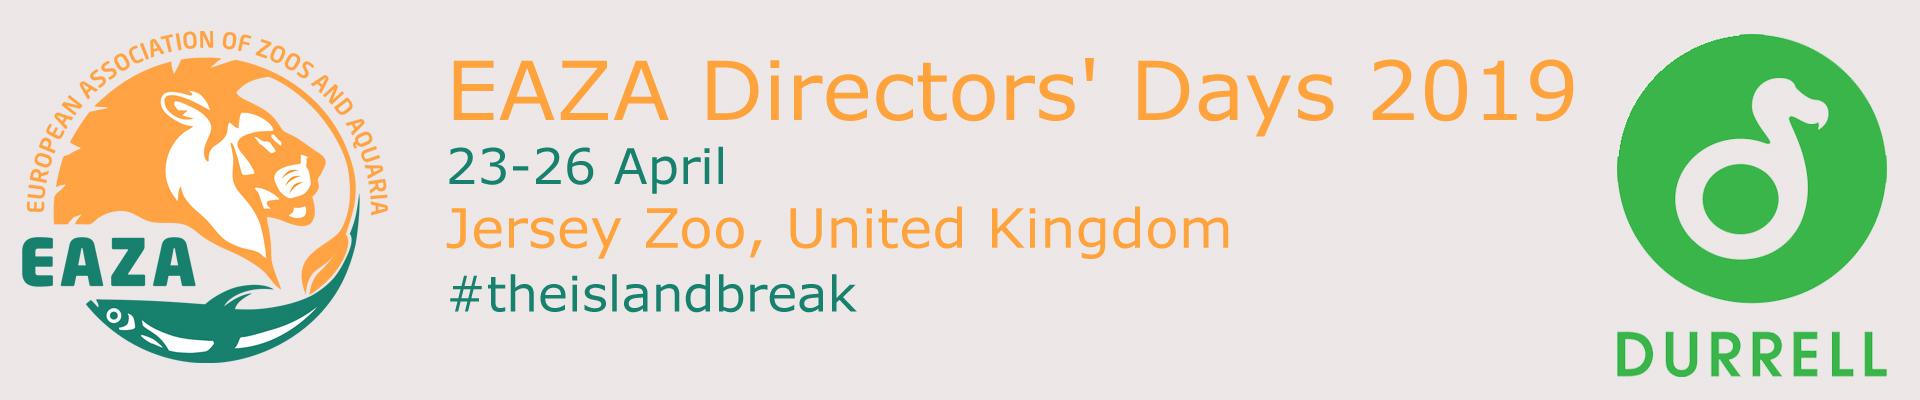 EAZA DIRECTORS' DAYS 2019